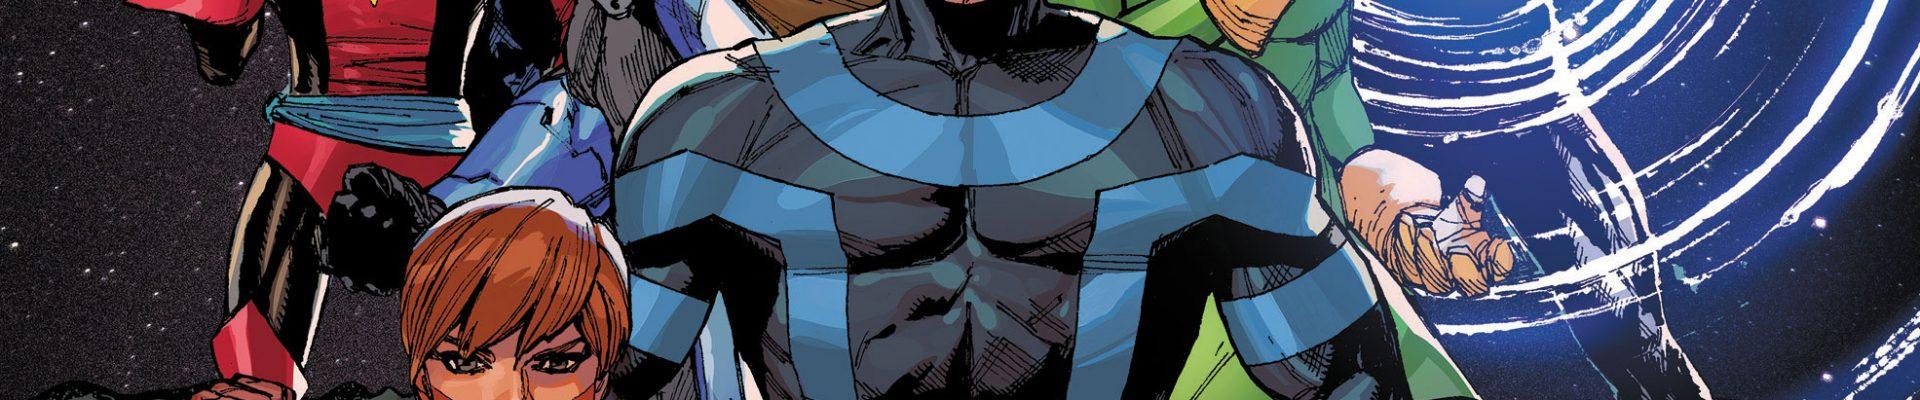 San Diego Comic-Con 2019 - Hickman's X-Men